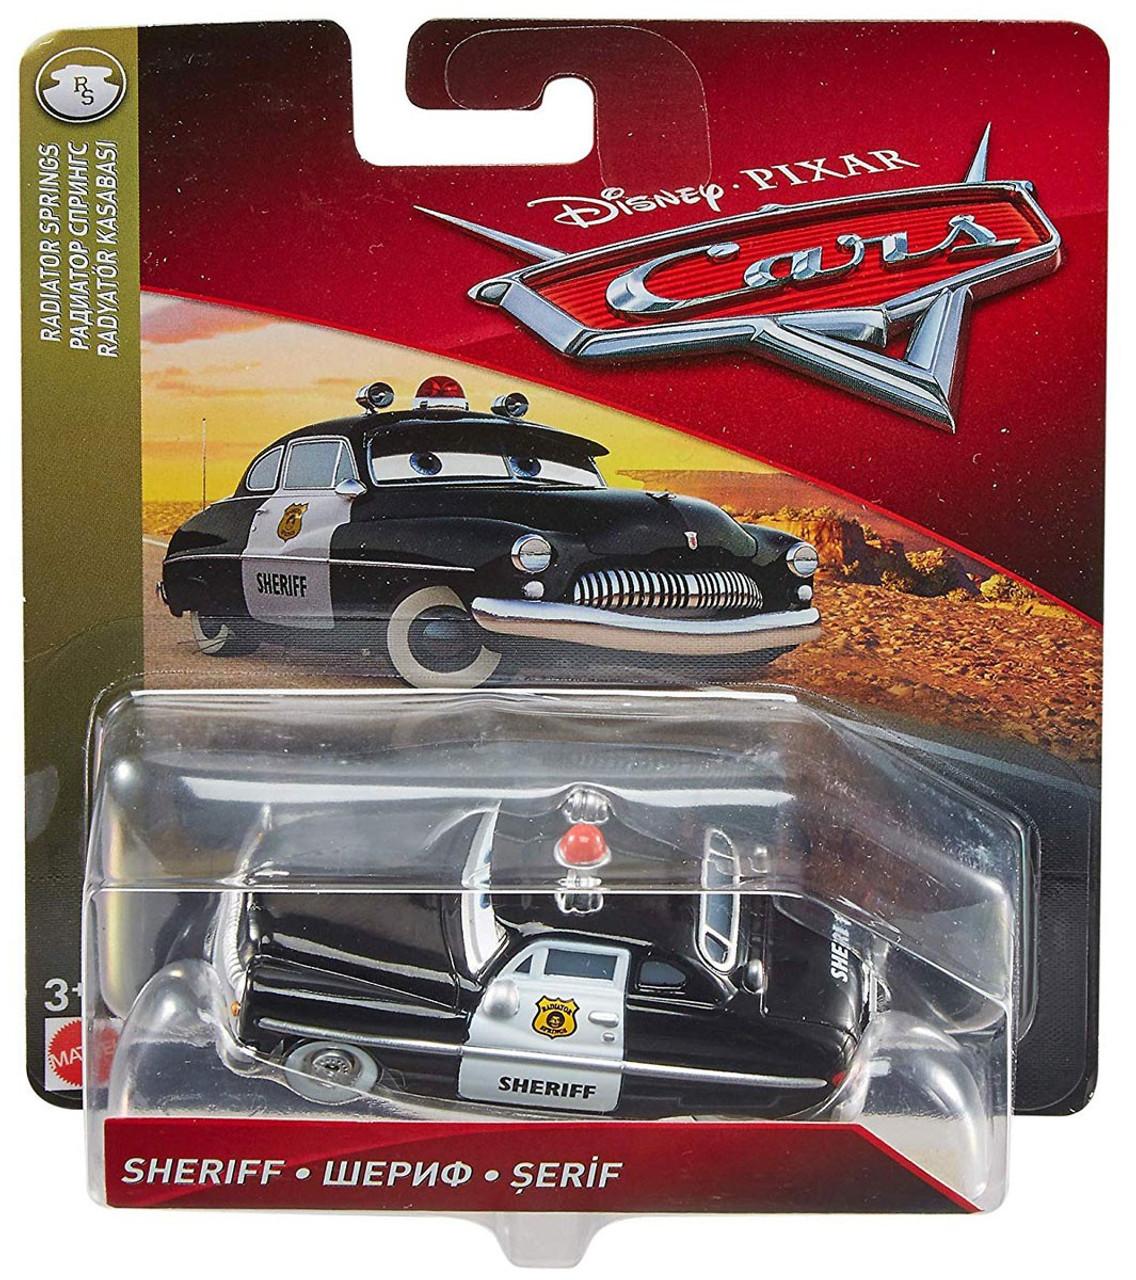 Disney Pixar Cars Cars 3 Radiator Springs Sheriff 155 Diecast Car